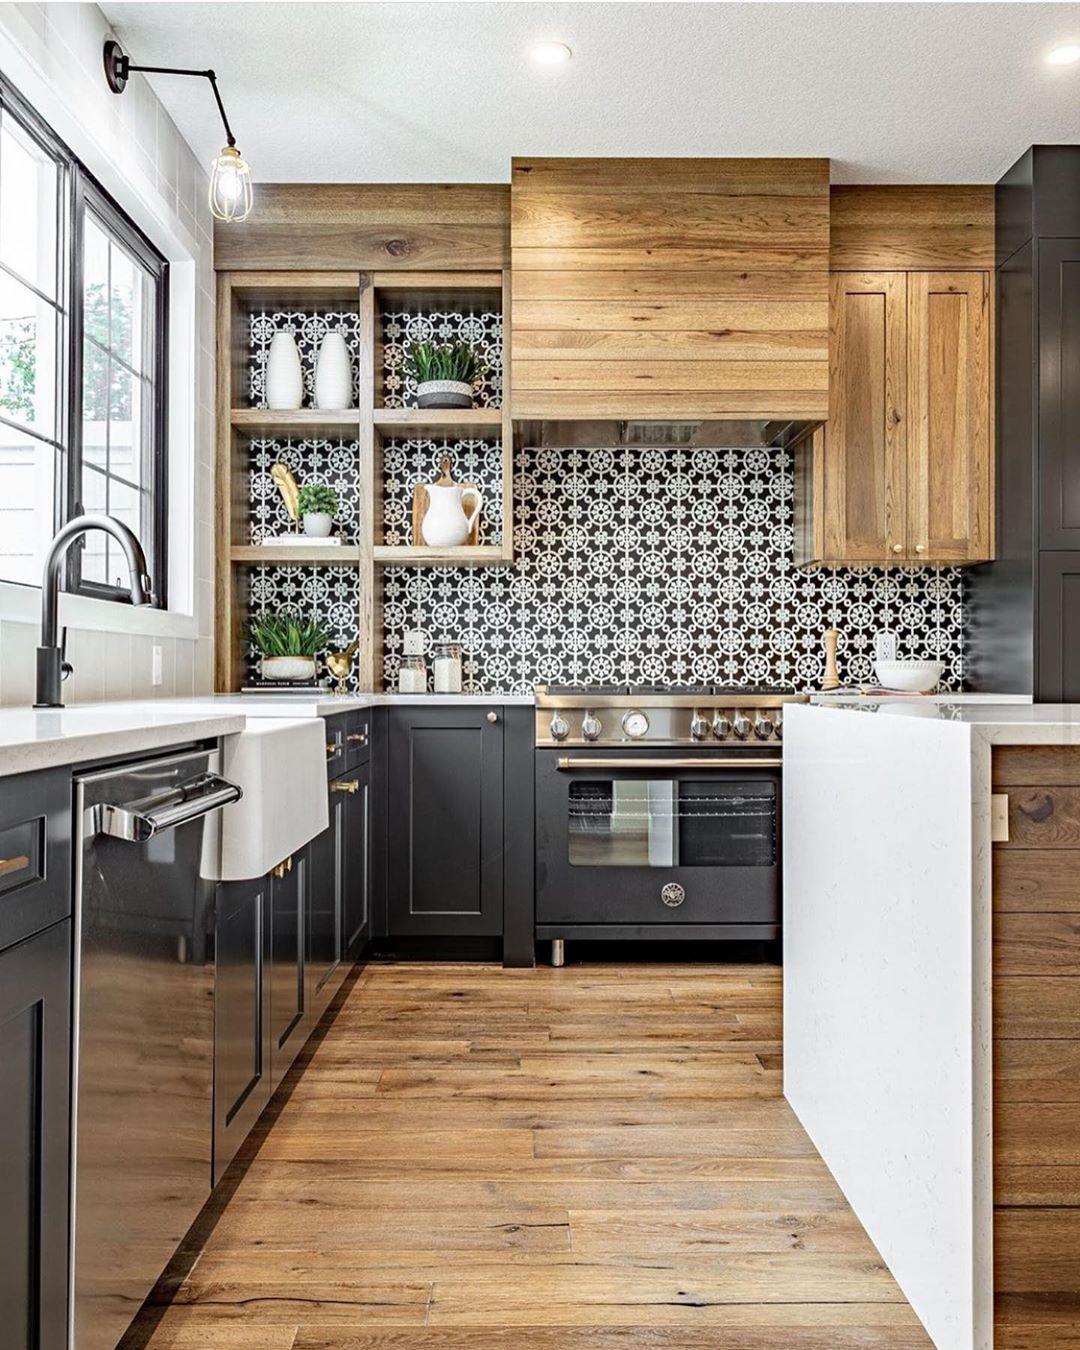 Kitchens Of Instagram Kitchens Of Insta Instagram Photos And Videos Kitchen Interior Home Decor Kitchen Kitchen Inspirations